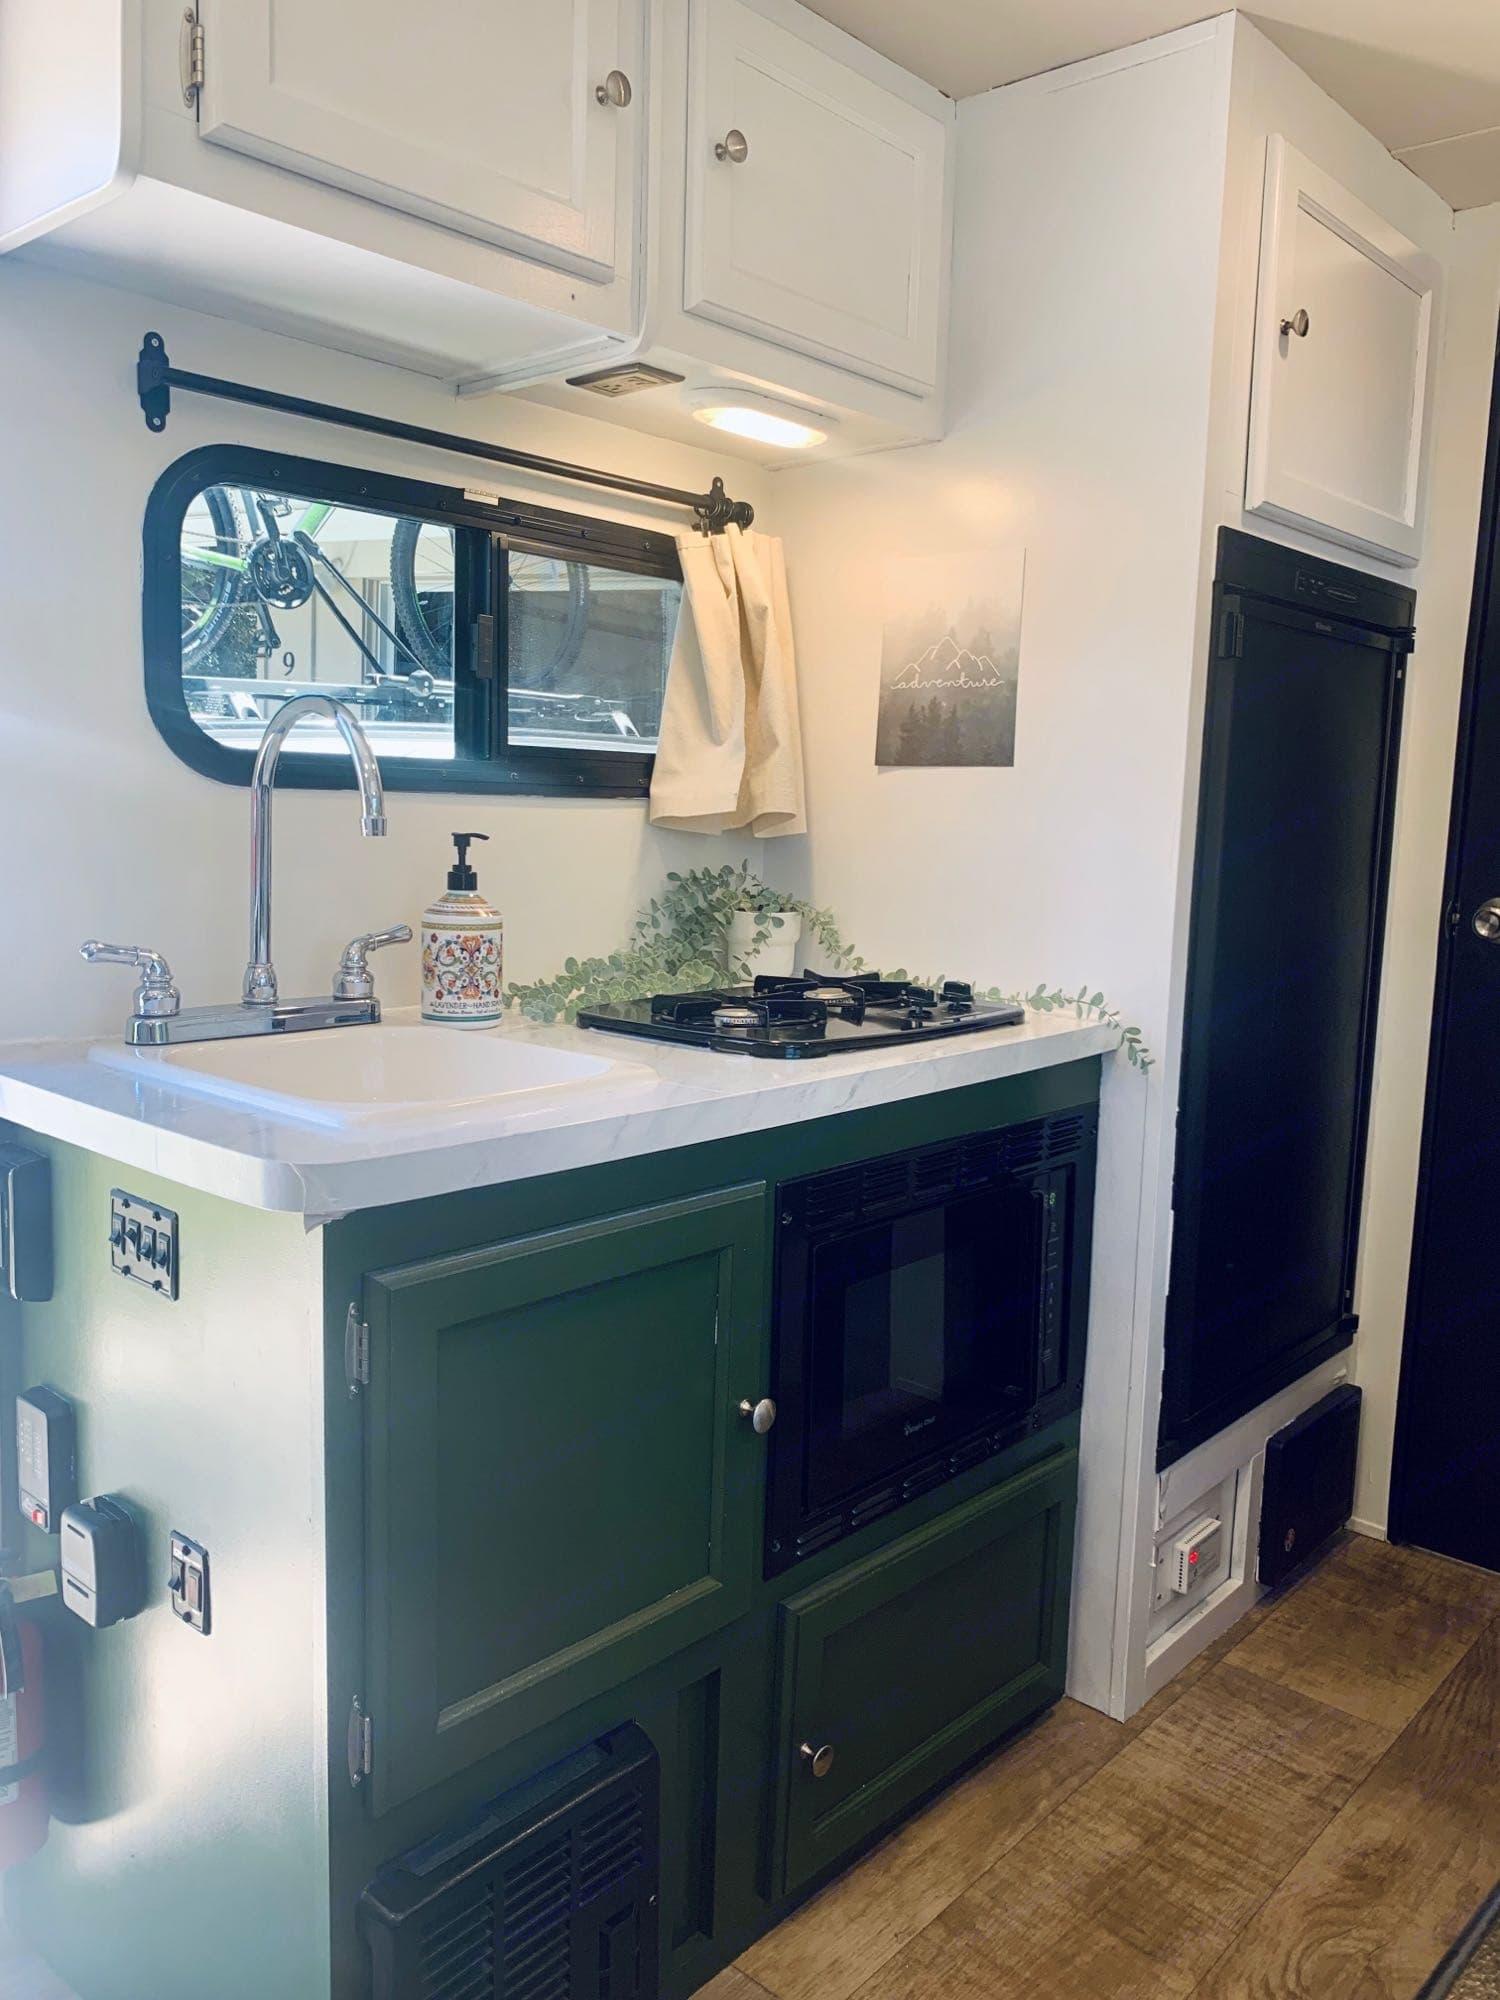 Sink, microwave, stove, fridge (with freezer compartment).. Palomino Palomini 2016